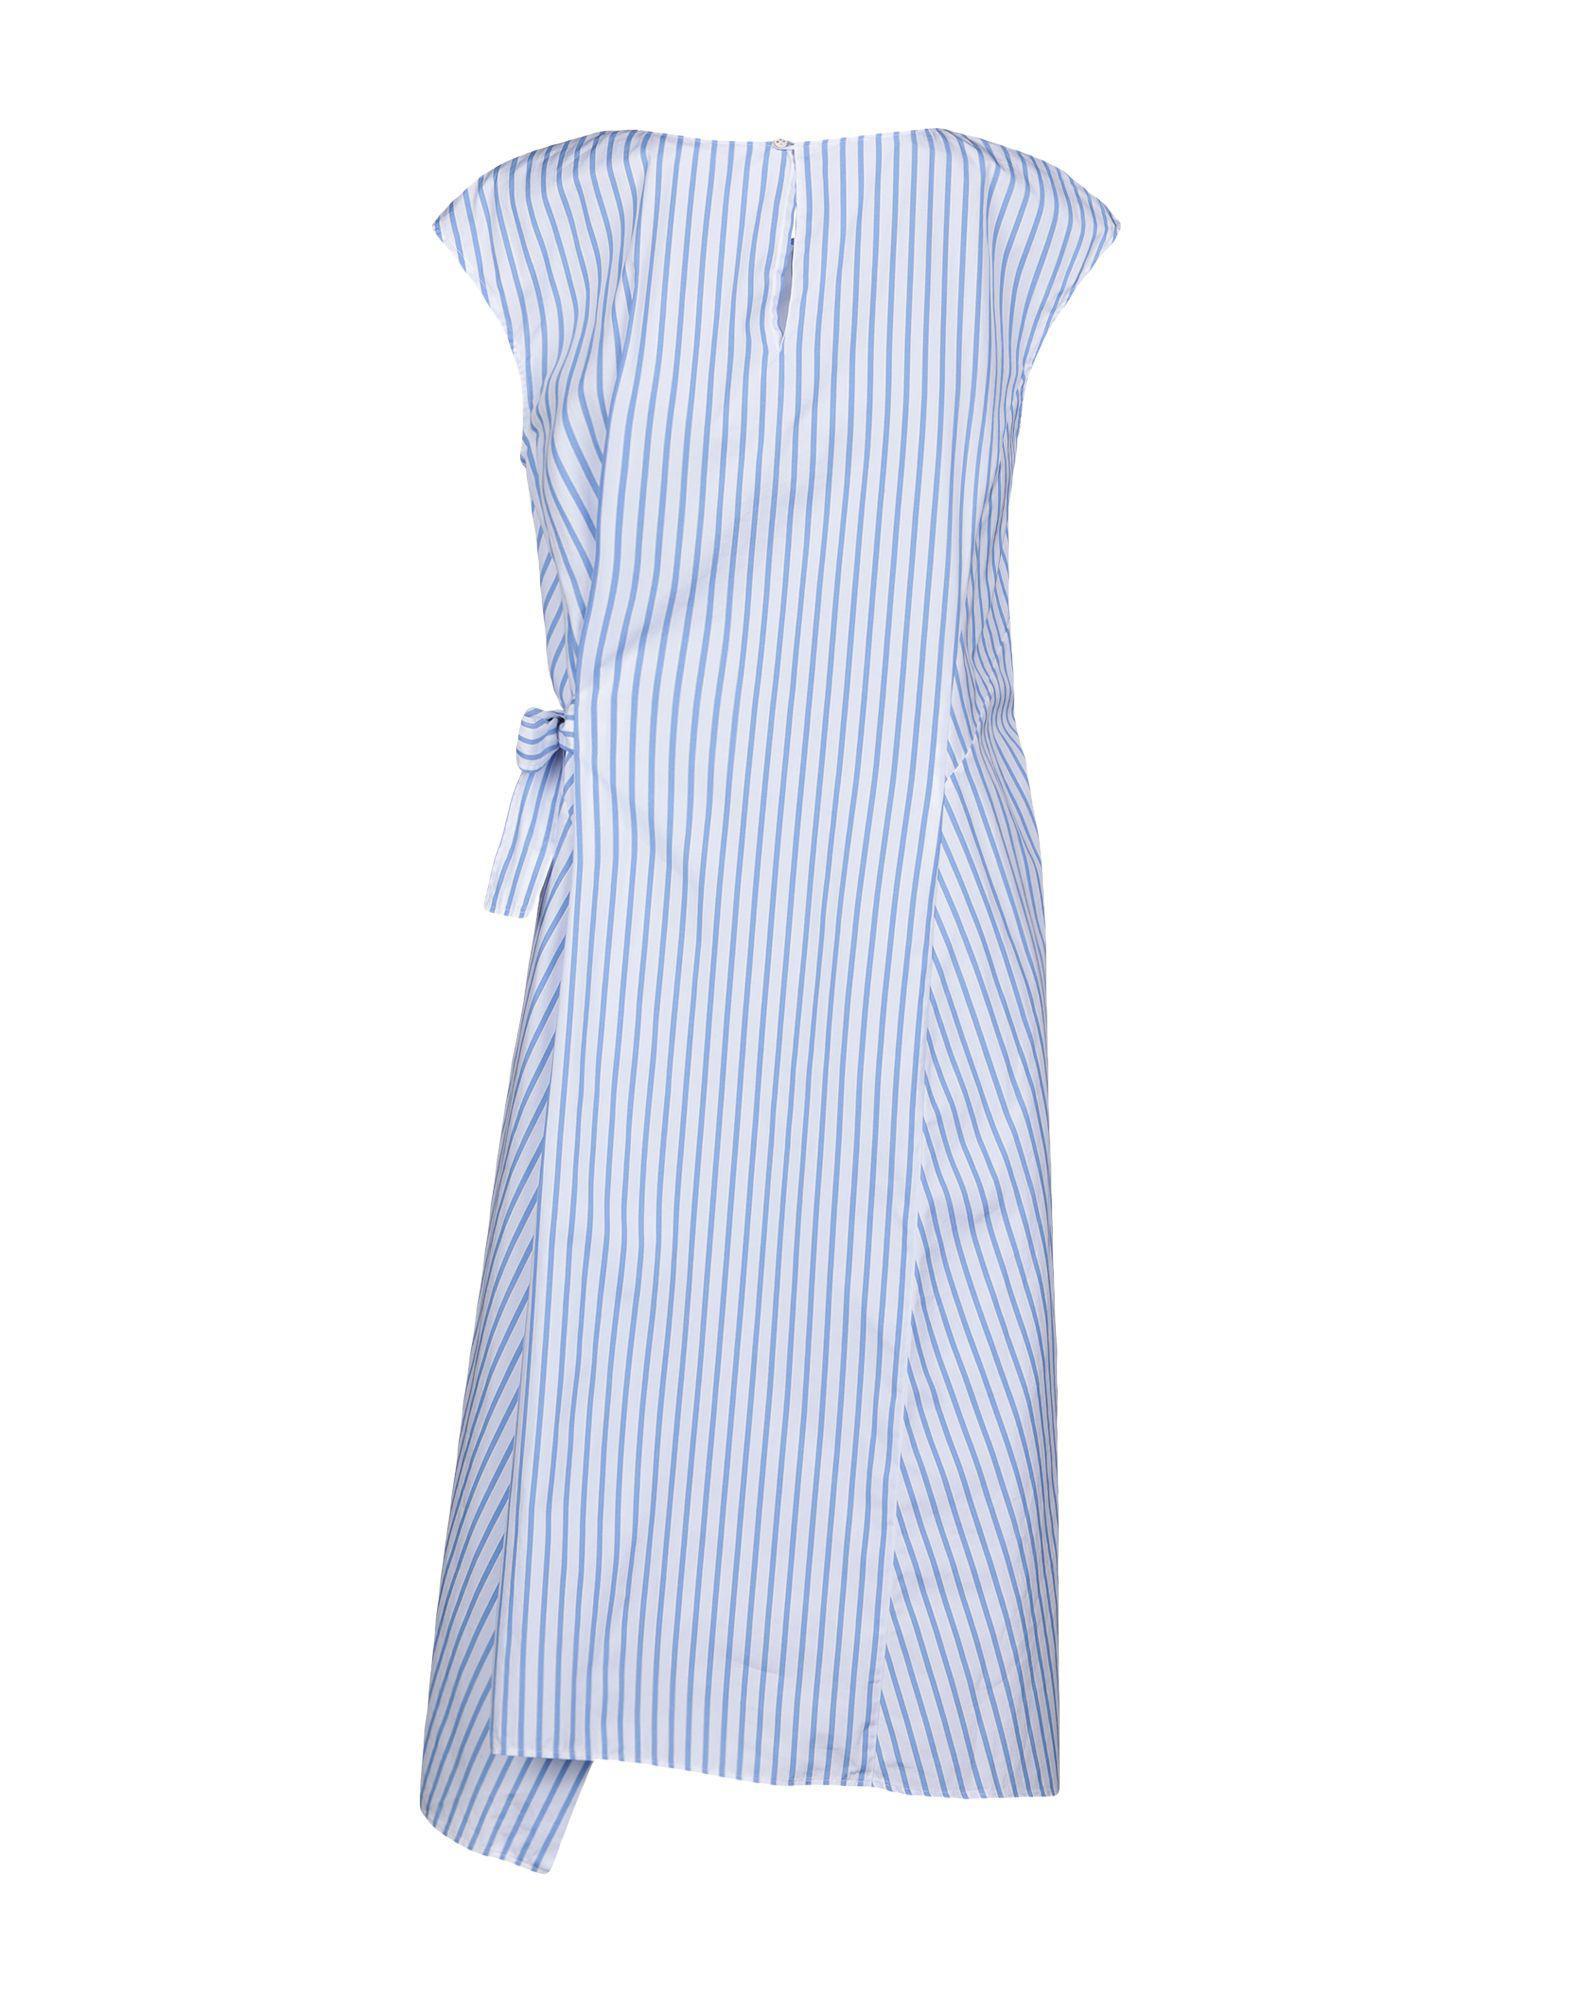 Blue Lyst Length Sarte In Le Pettegole Dress Knee nwtqY8qC0f